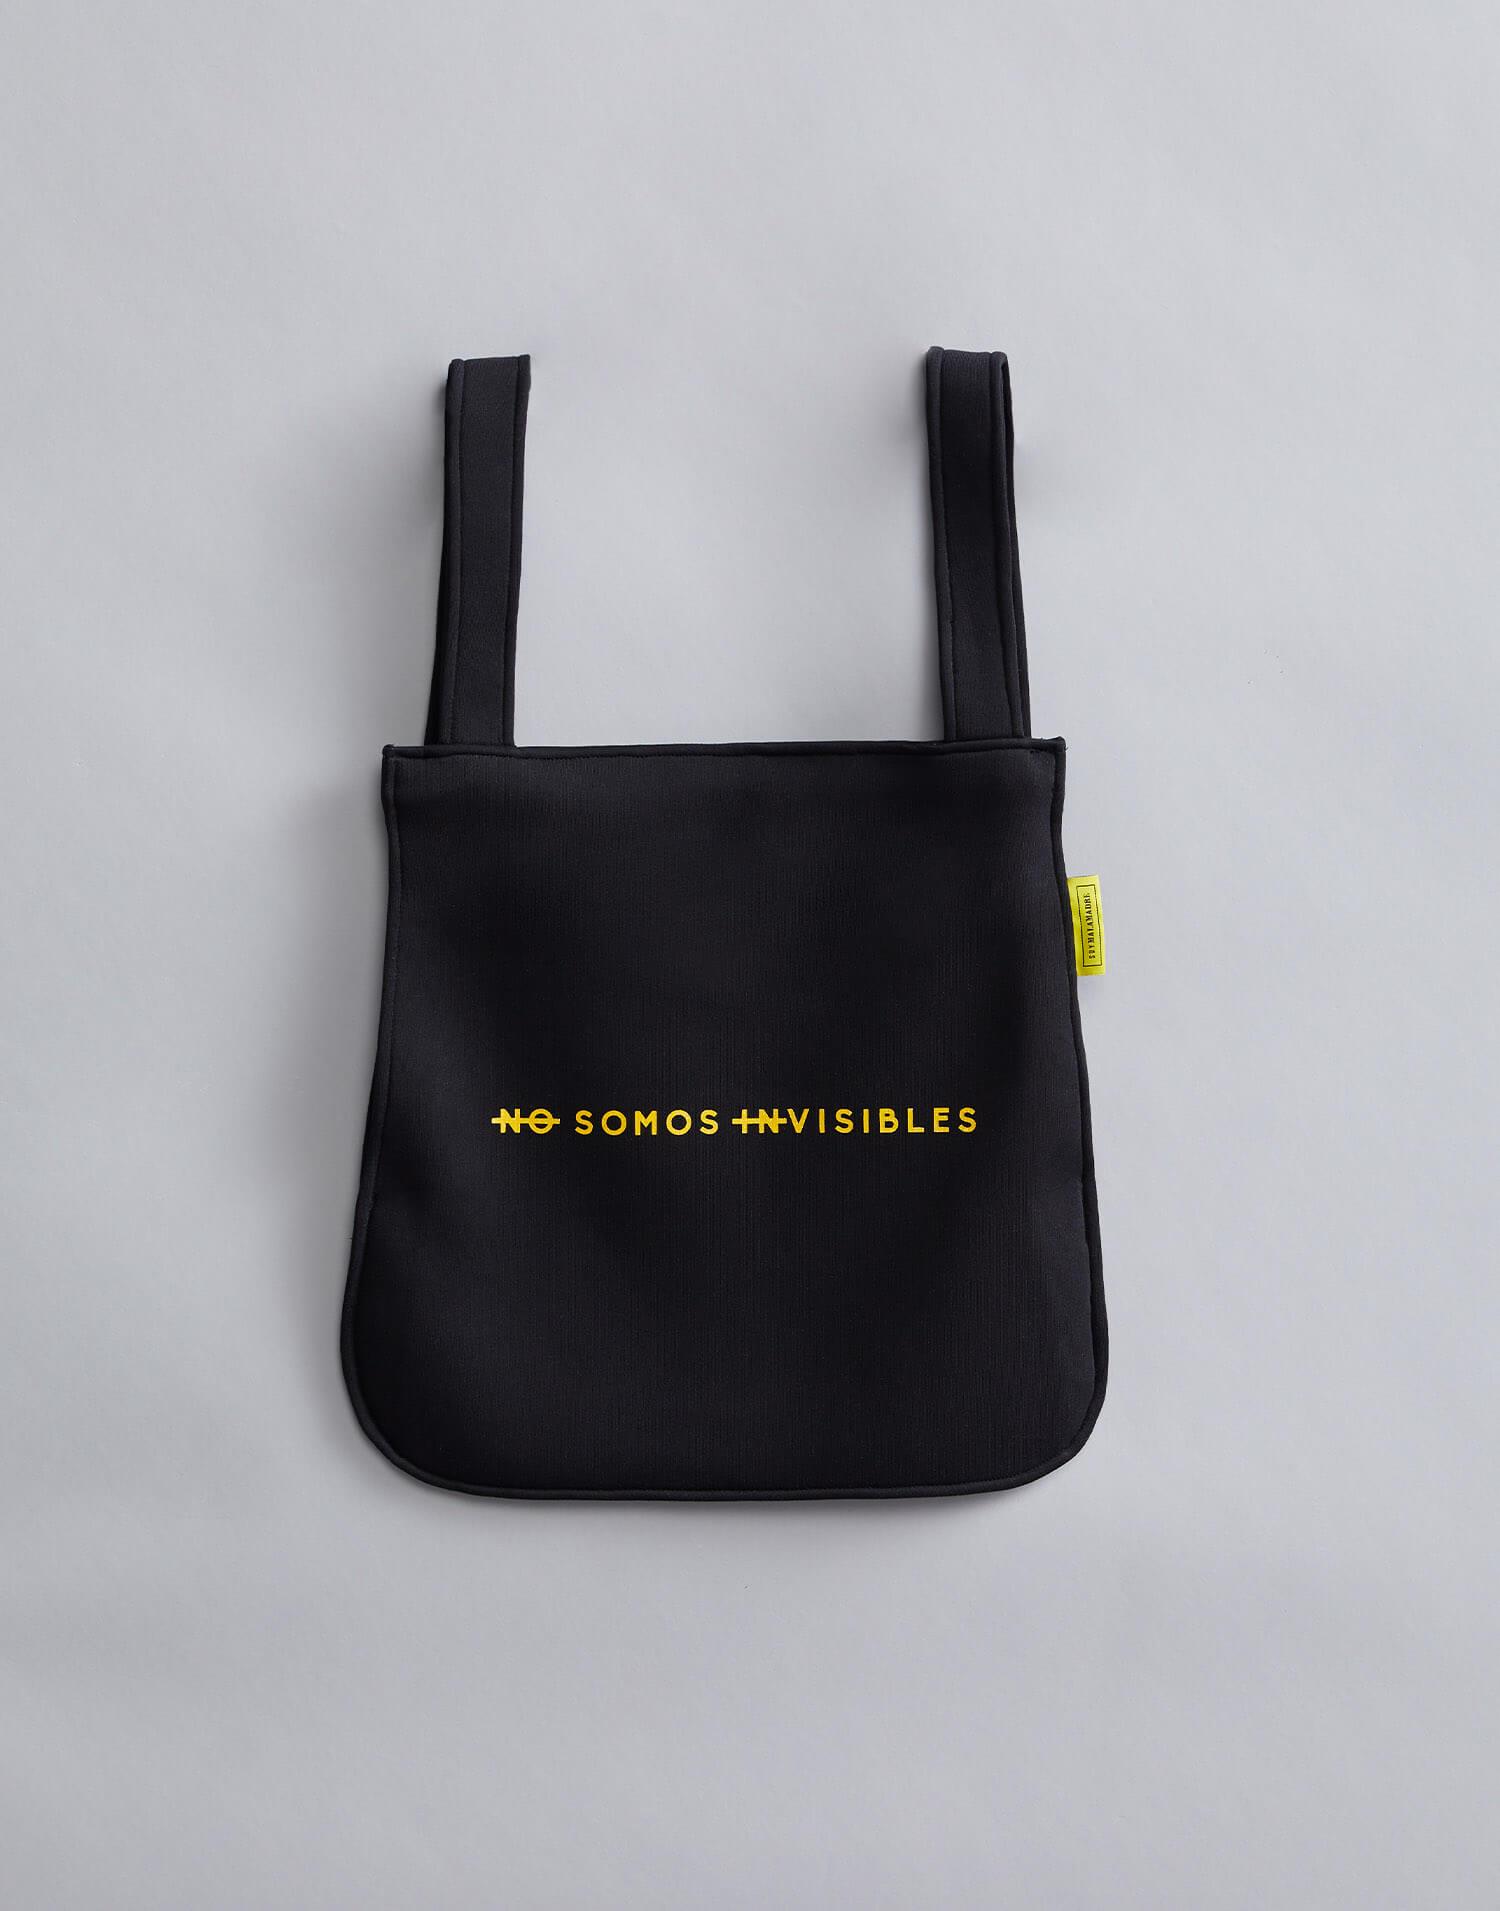 mochila negra no somos invisibles